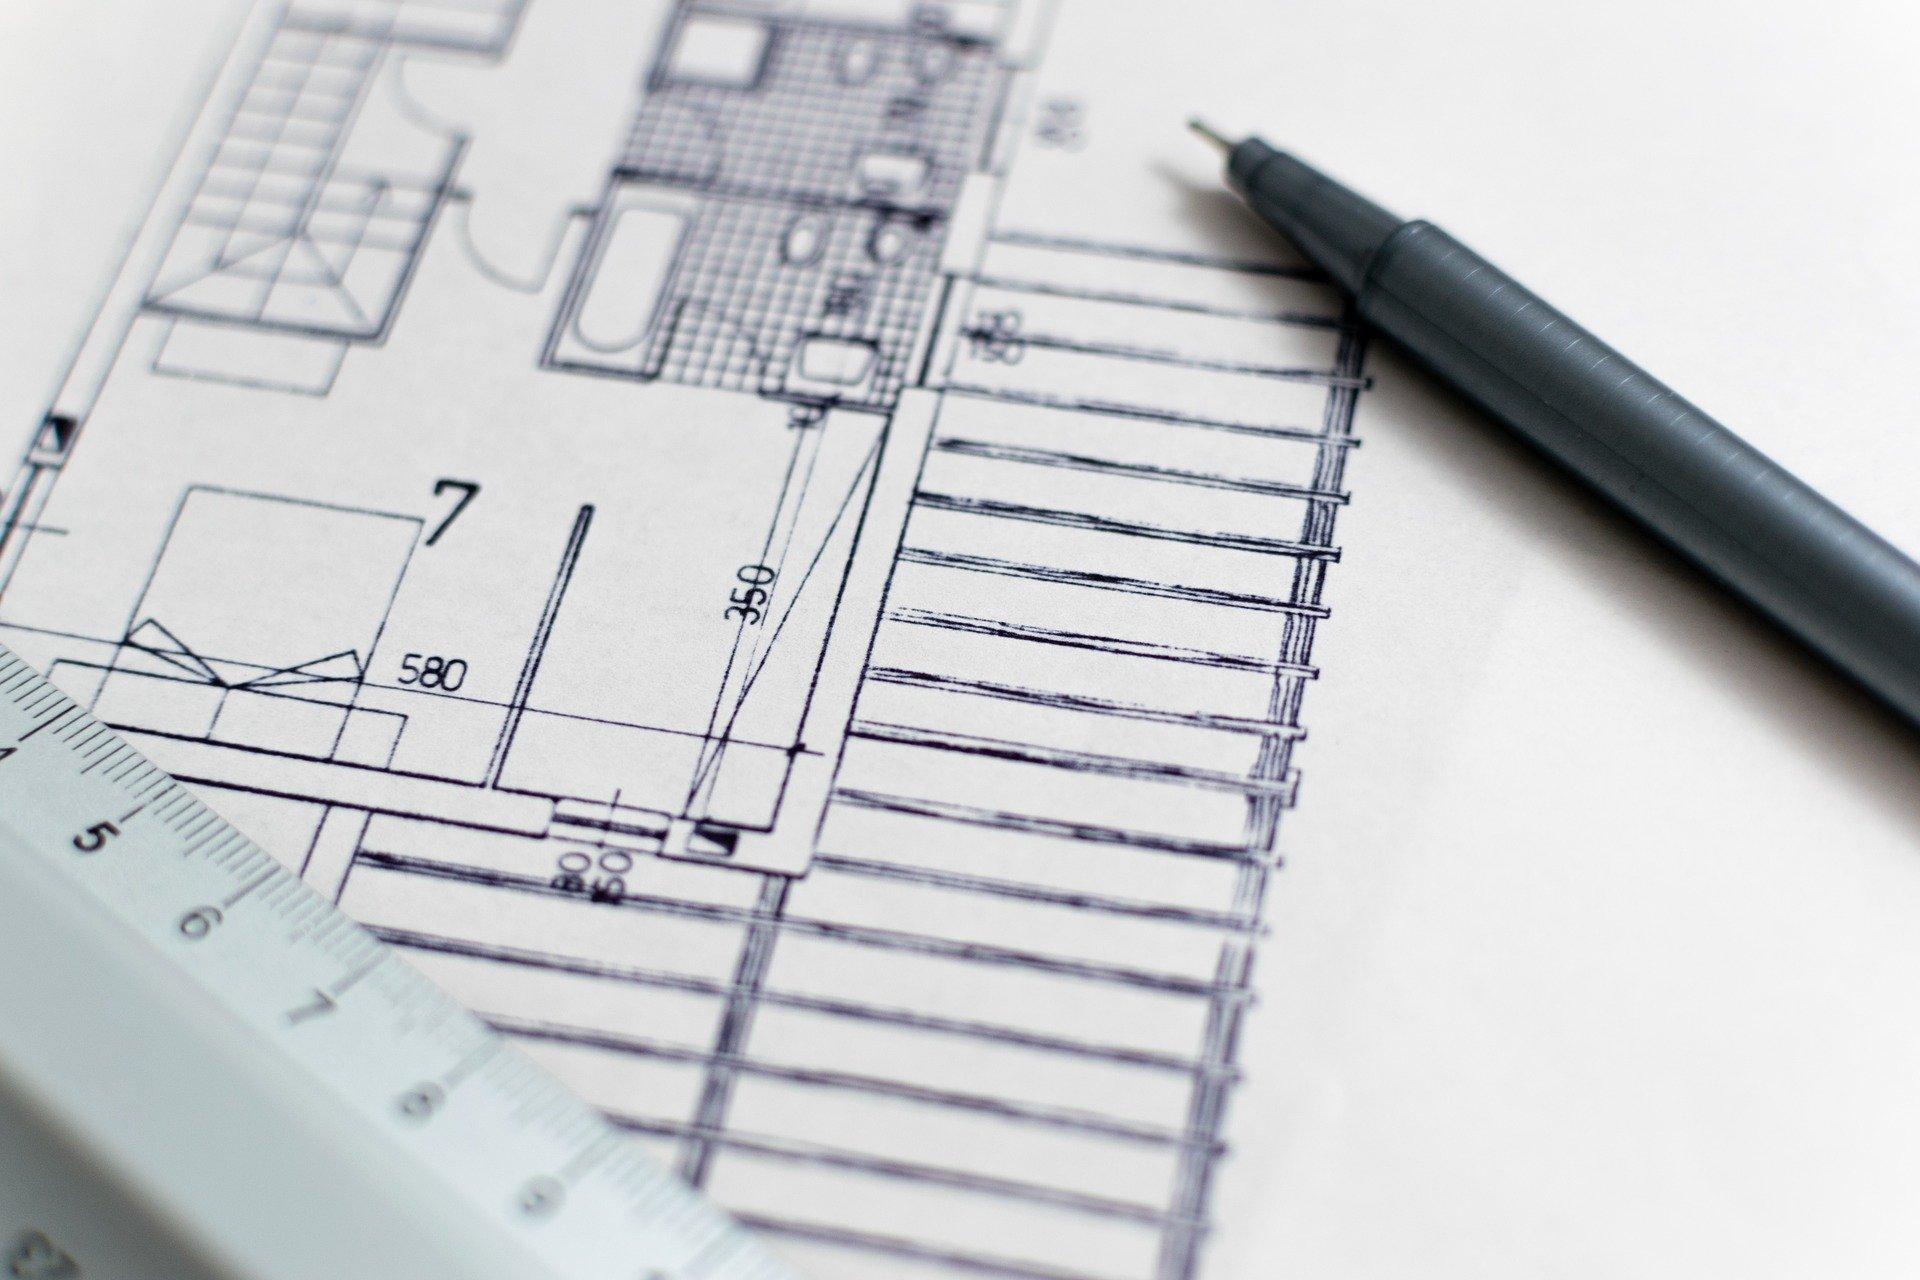 De juiste keuze van architect